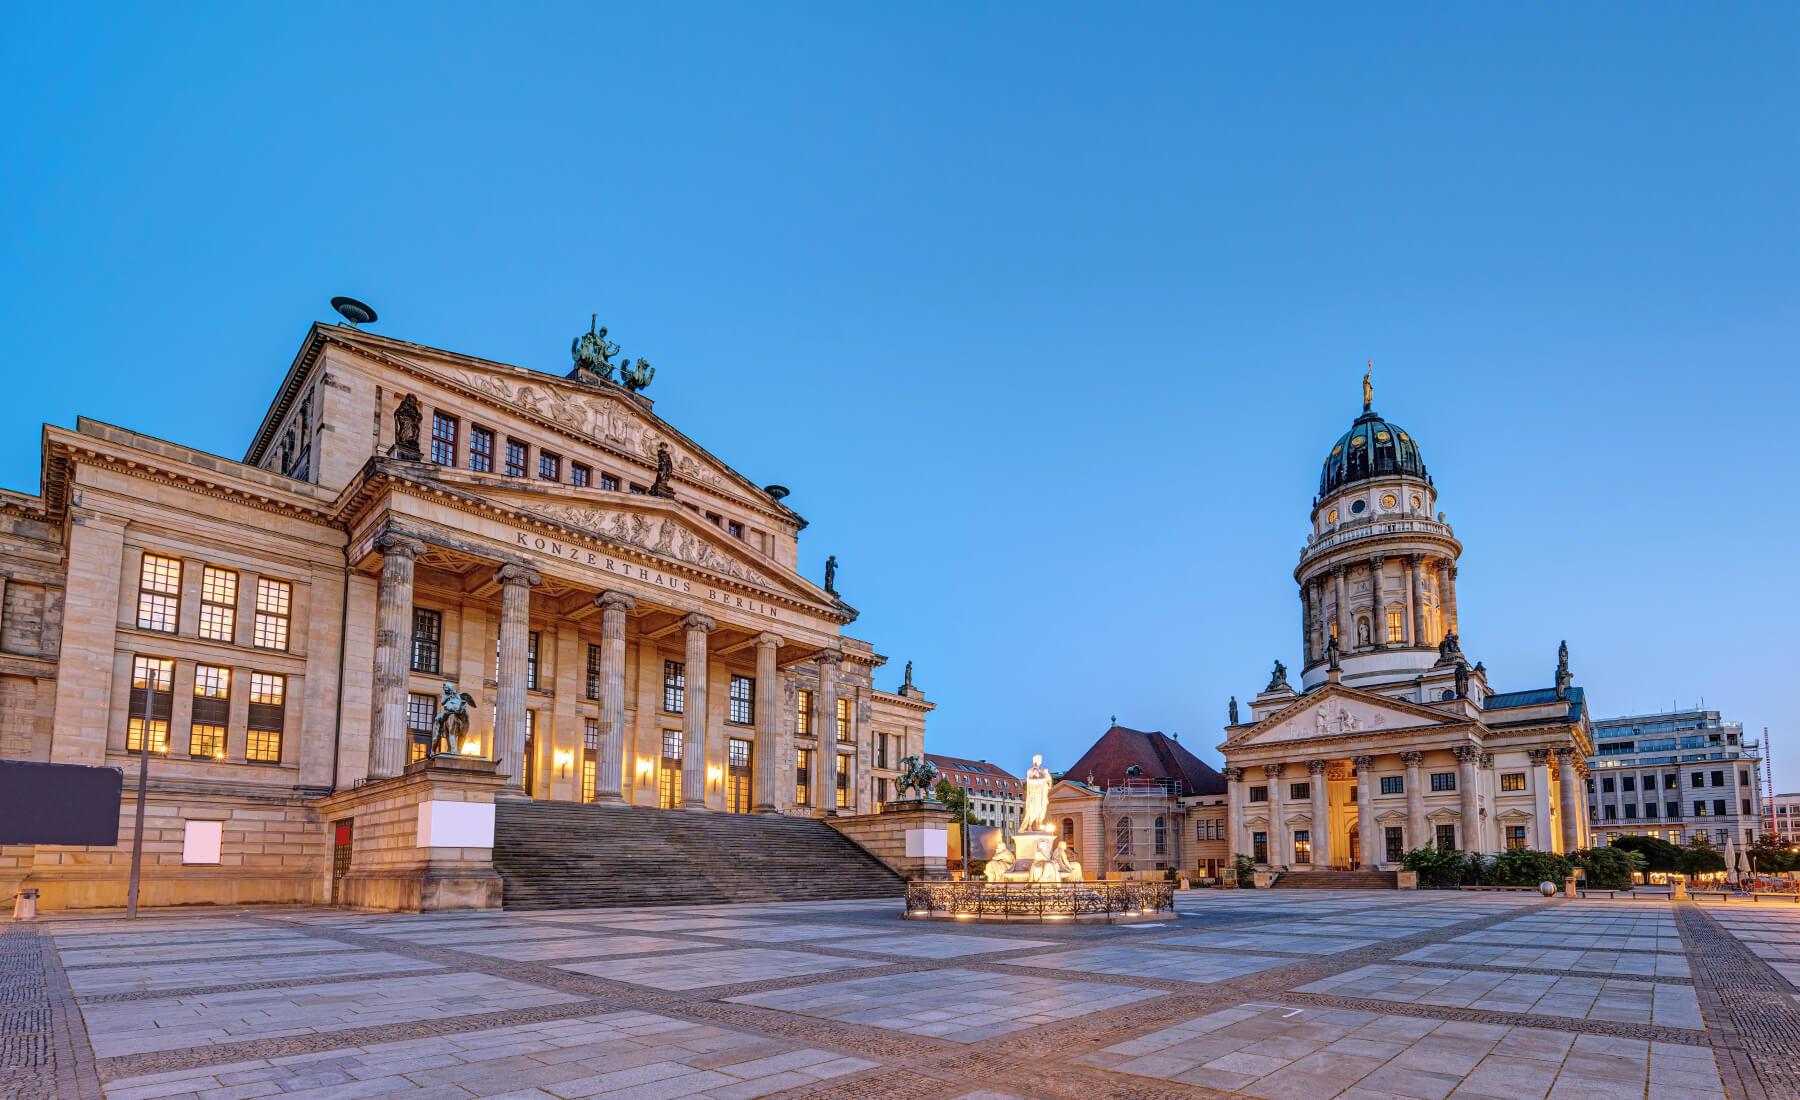 Urogenitale Diagnostik Berlin